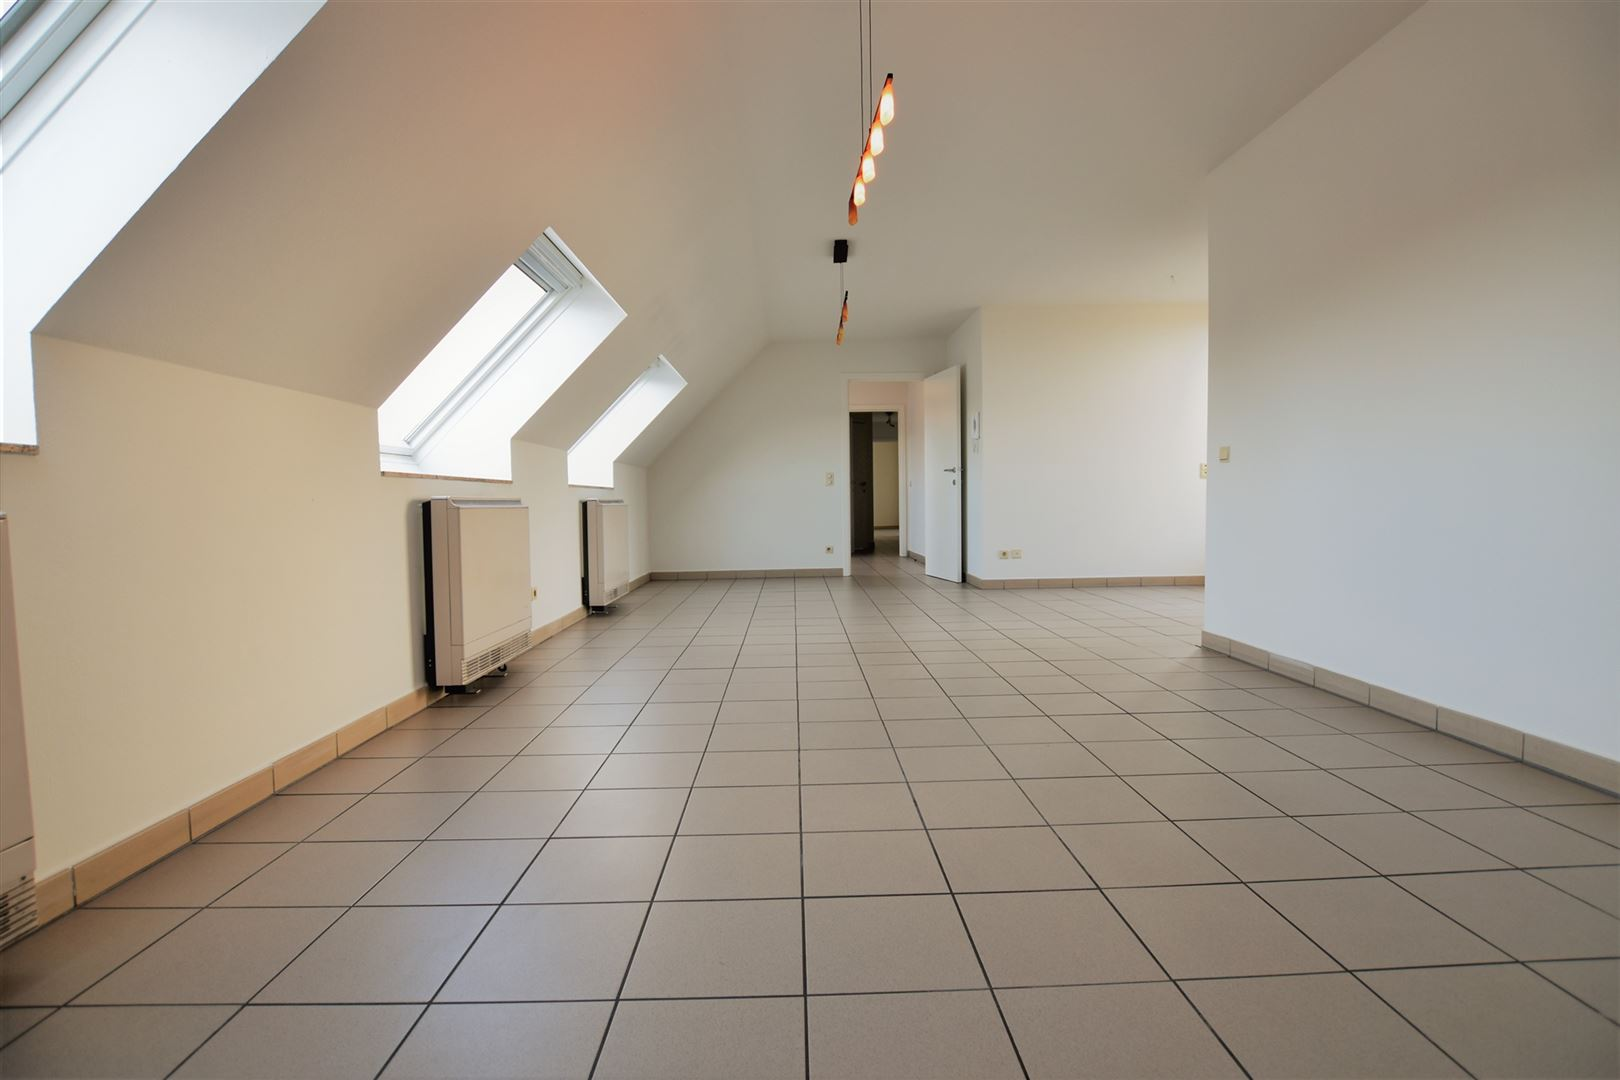 Foto 8 : Appartement te 9280 Lebbeke (België) - Prijs € 645